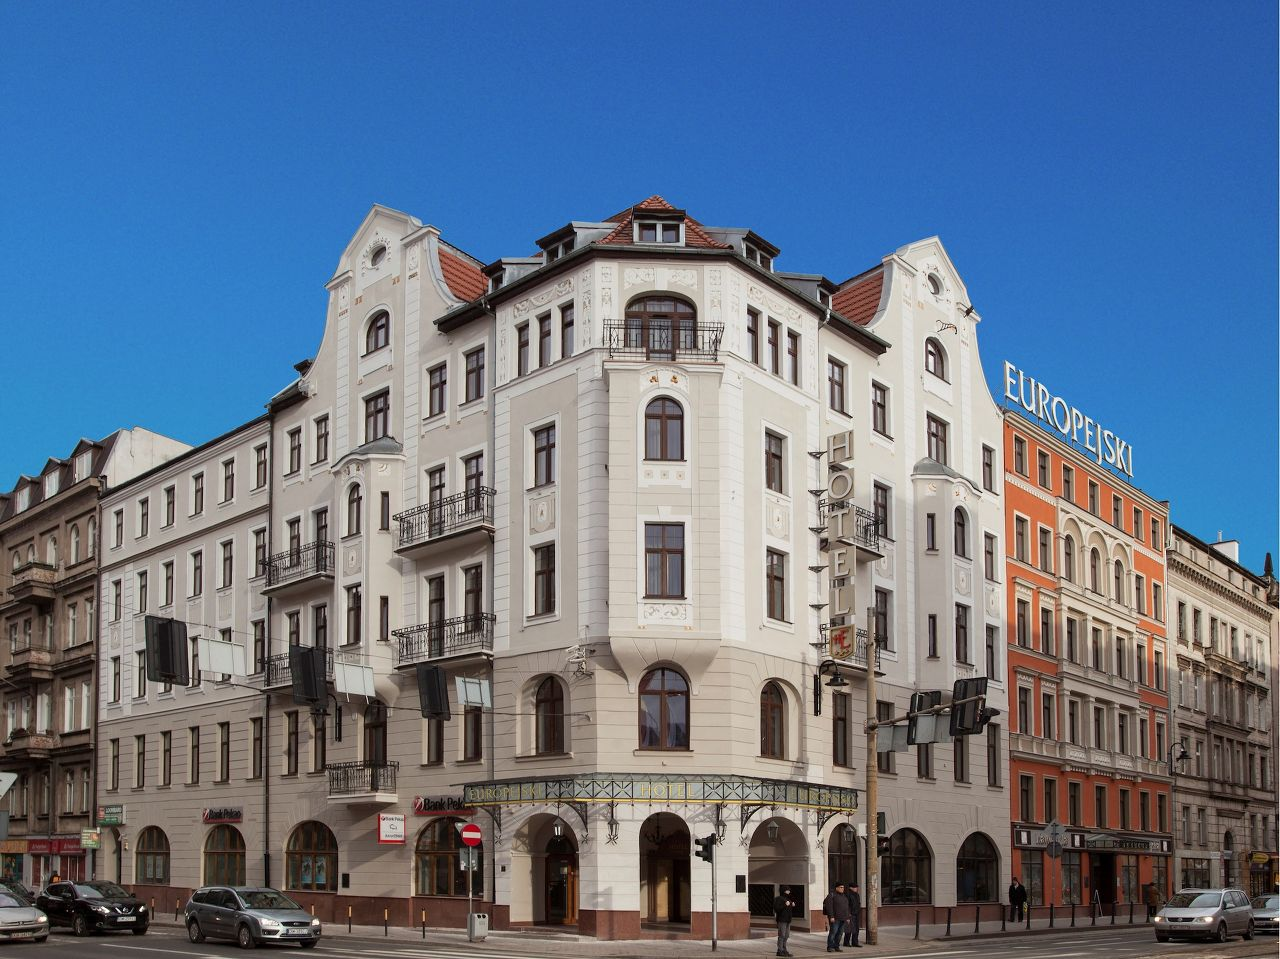 Photo 1 of Hotel Europejski